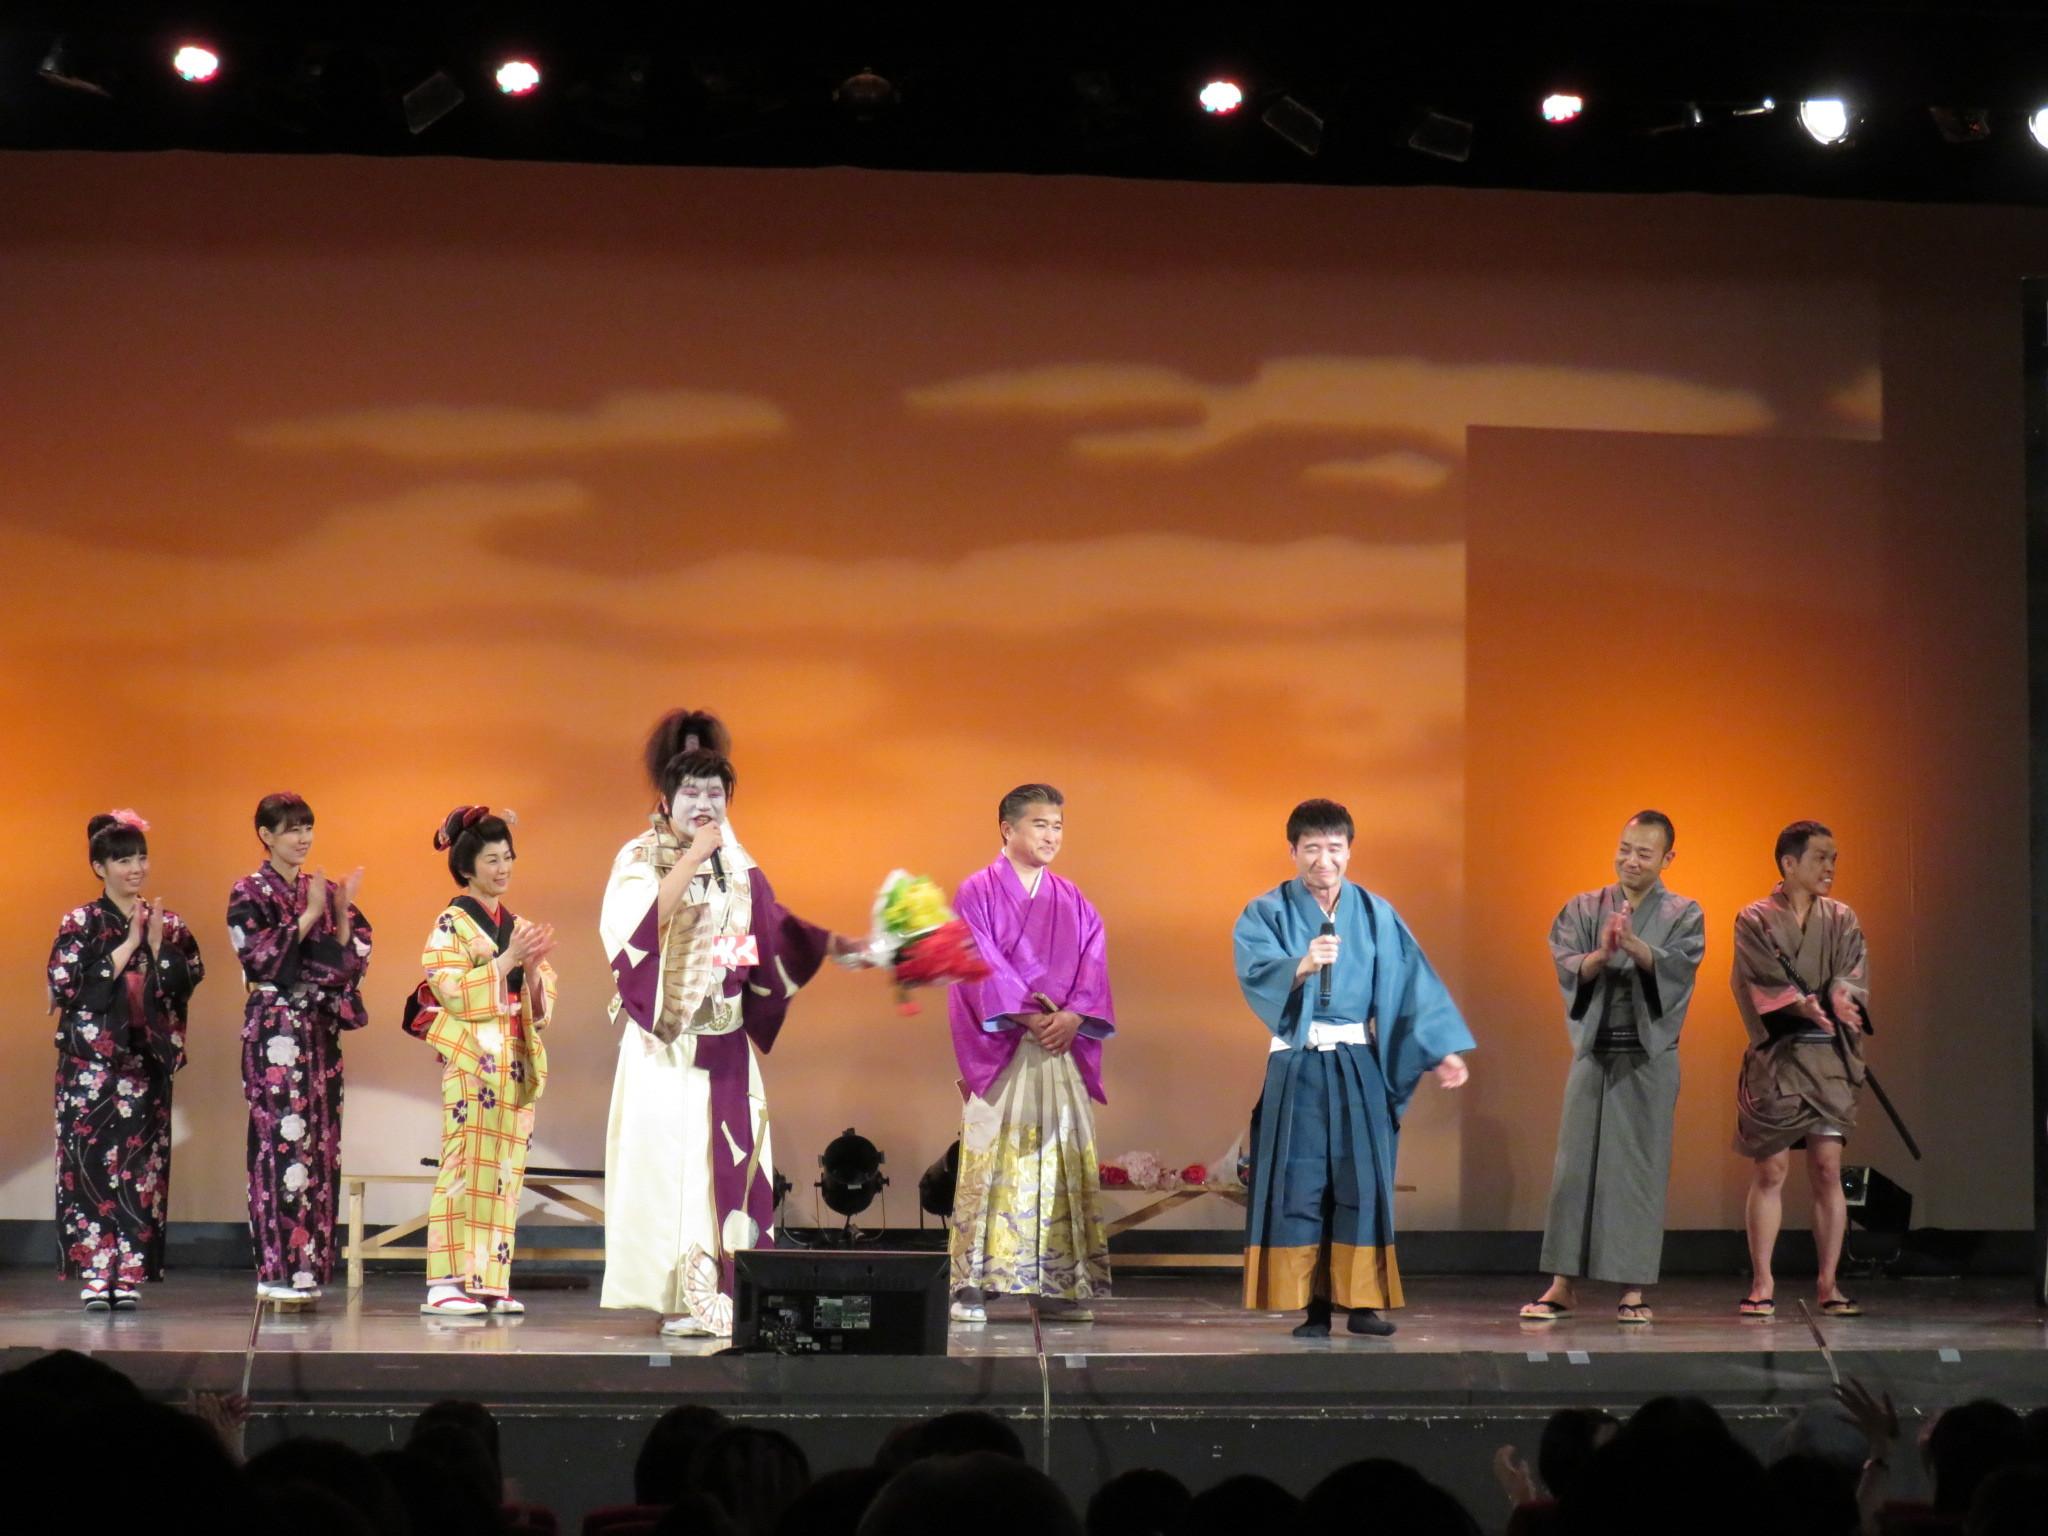 http://news.yoshimoto.co.jp/photos/uncategorized/2015/05/31/20150531140630-4be4eb579bb934d92aca902da58f371b32382327.jpg